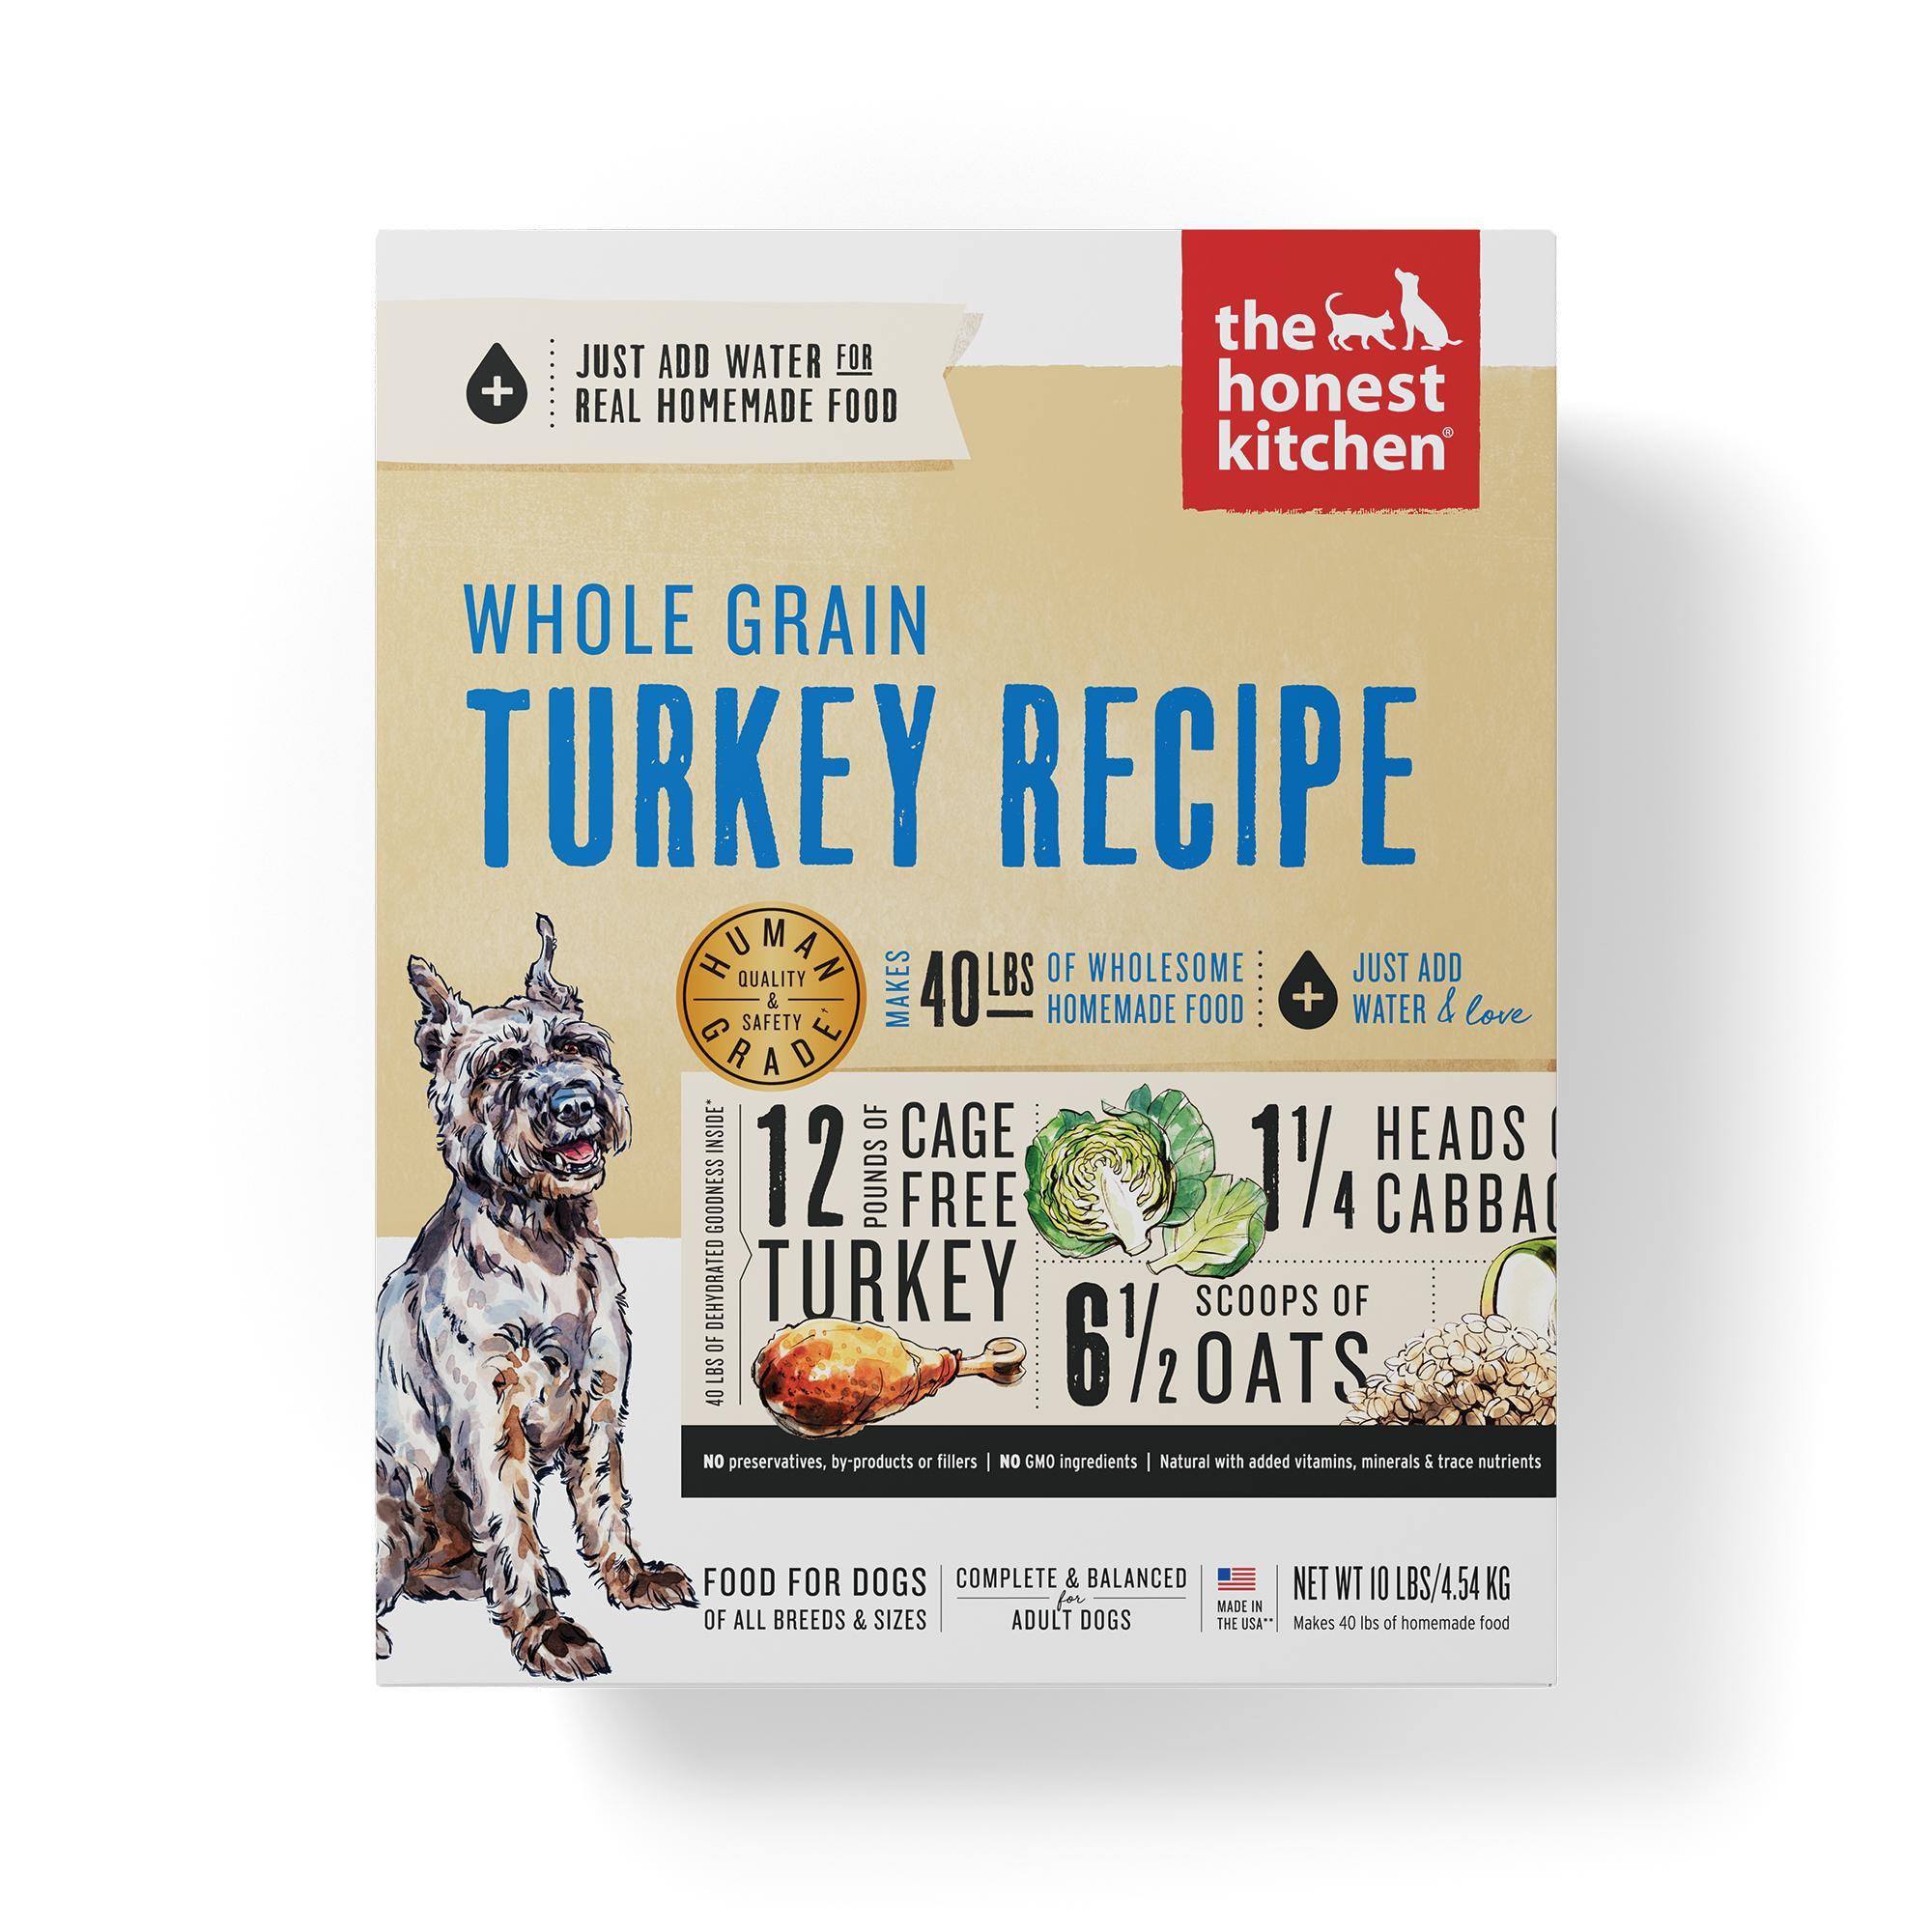 The Honest Kitchen Whole Grain Turkey Recipe Dehydrated Dog Food, 10-lb box